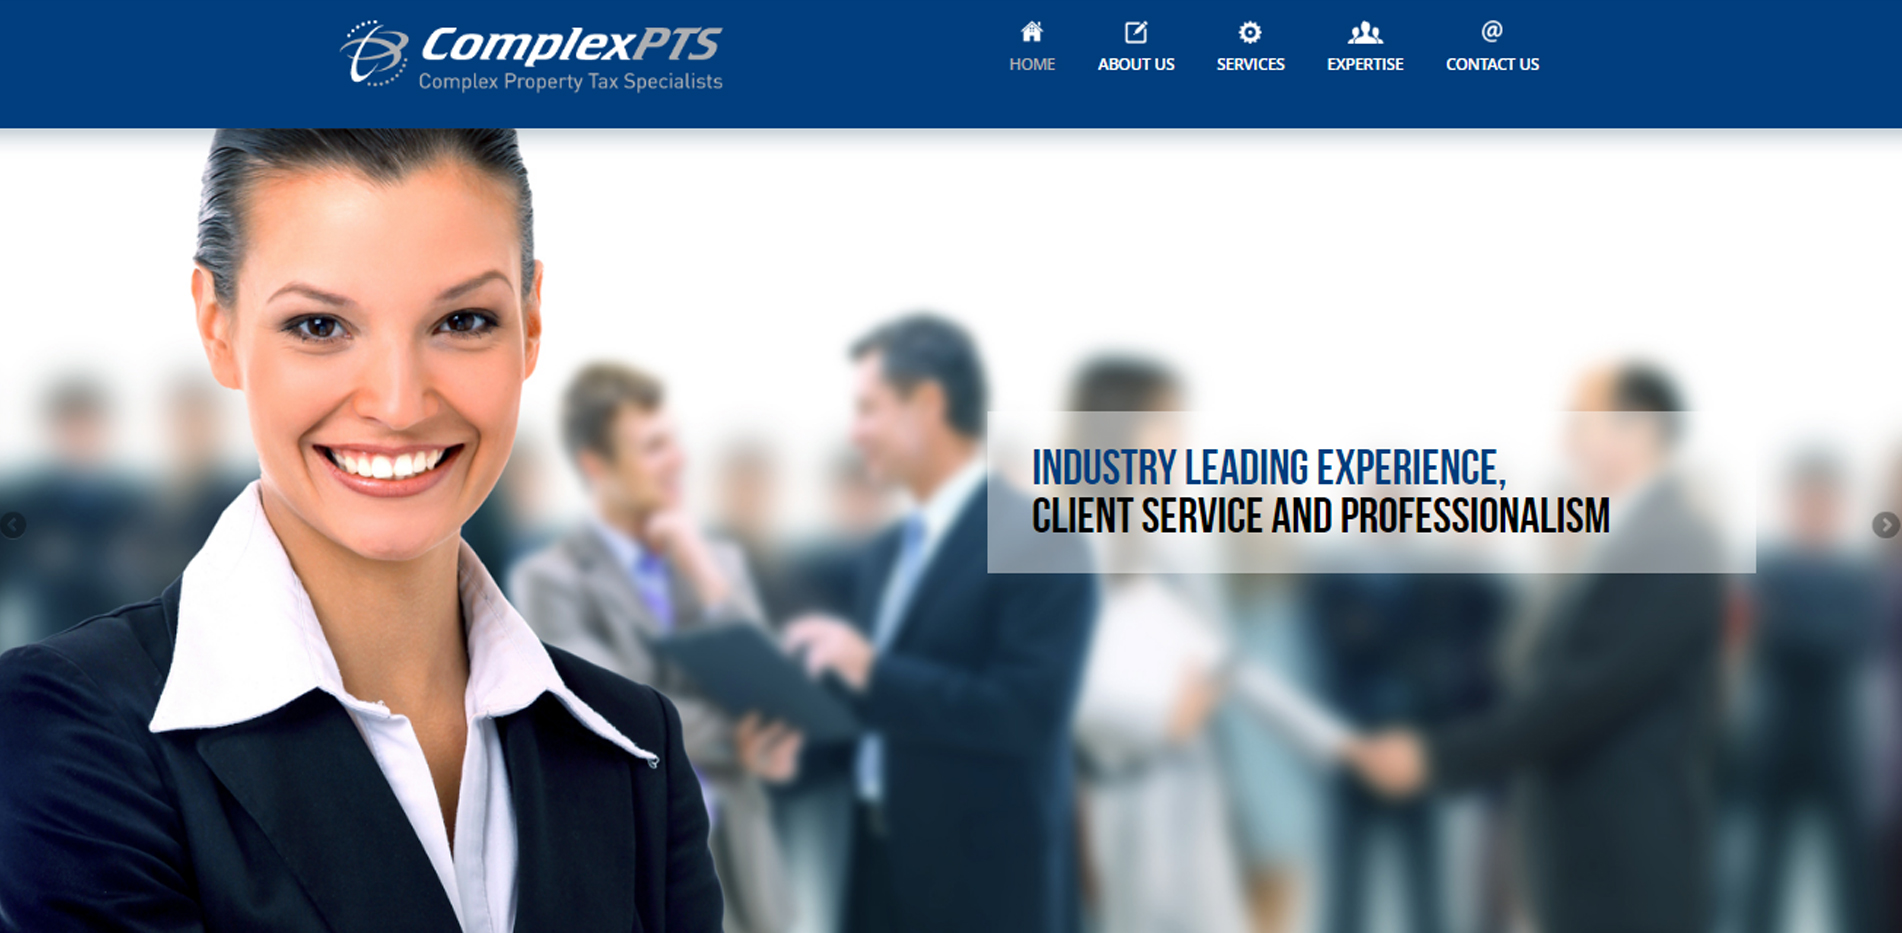 company | development | web design company | web designers | atlanta web design | companies